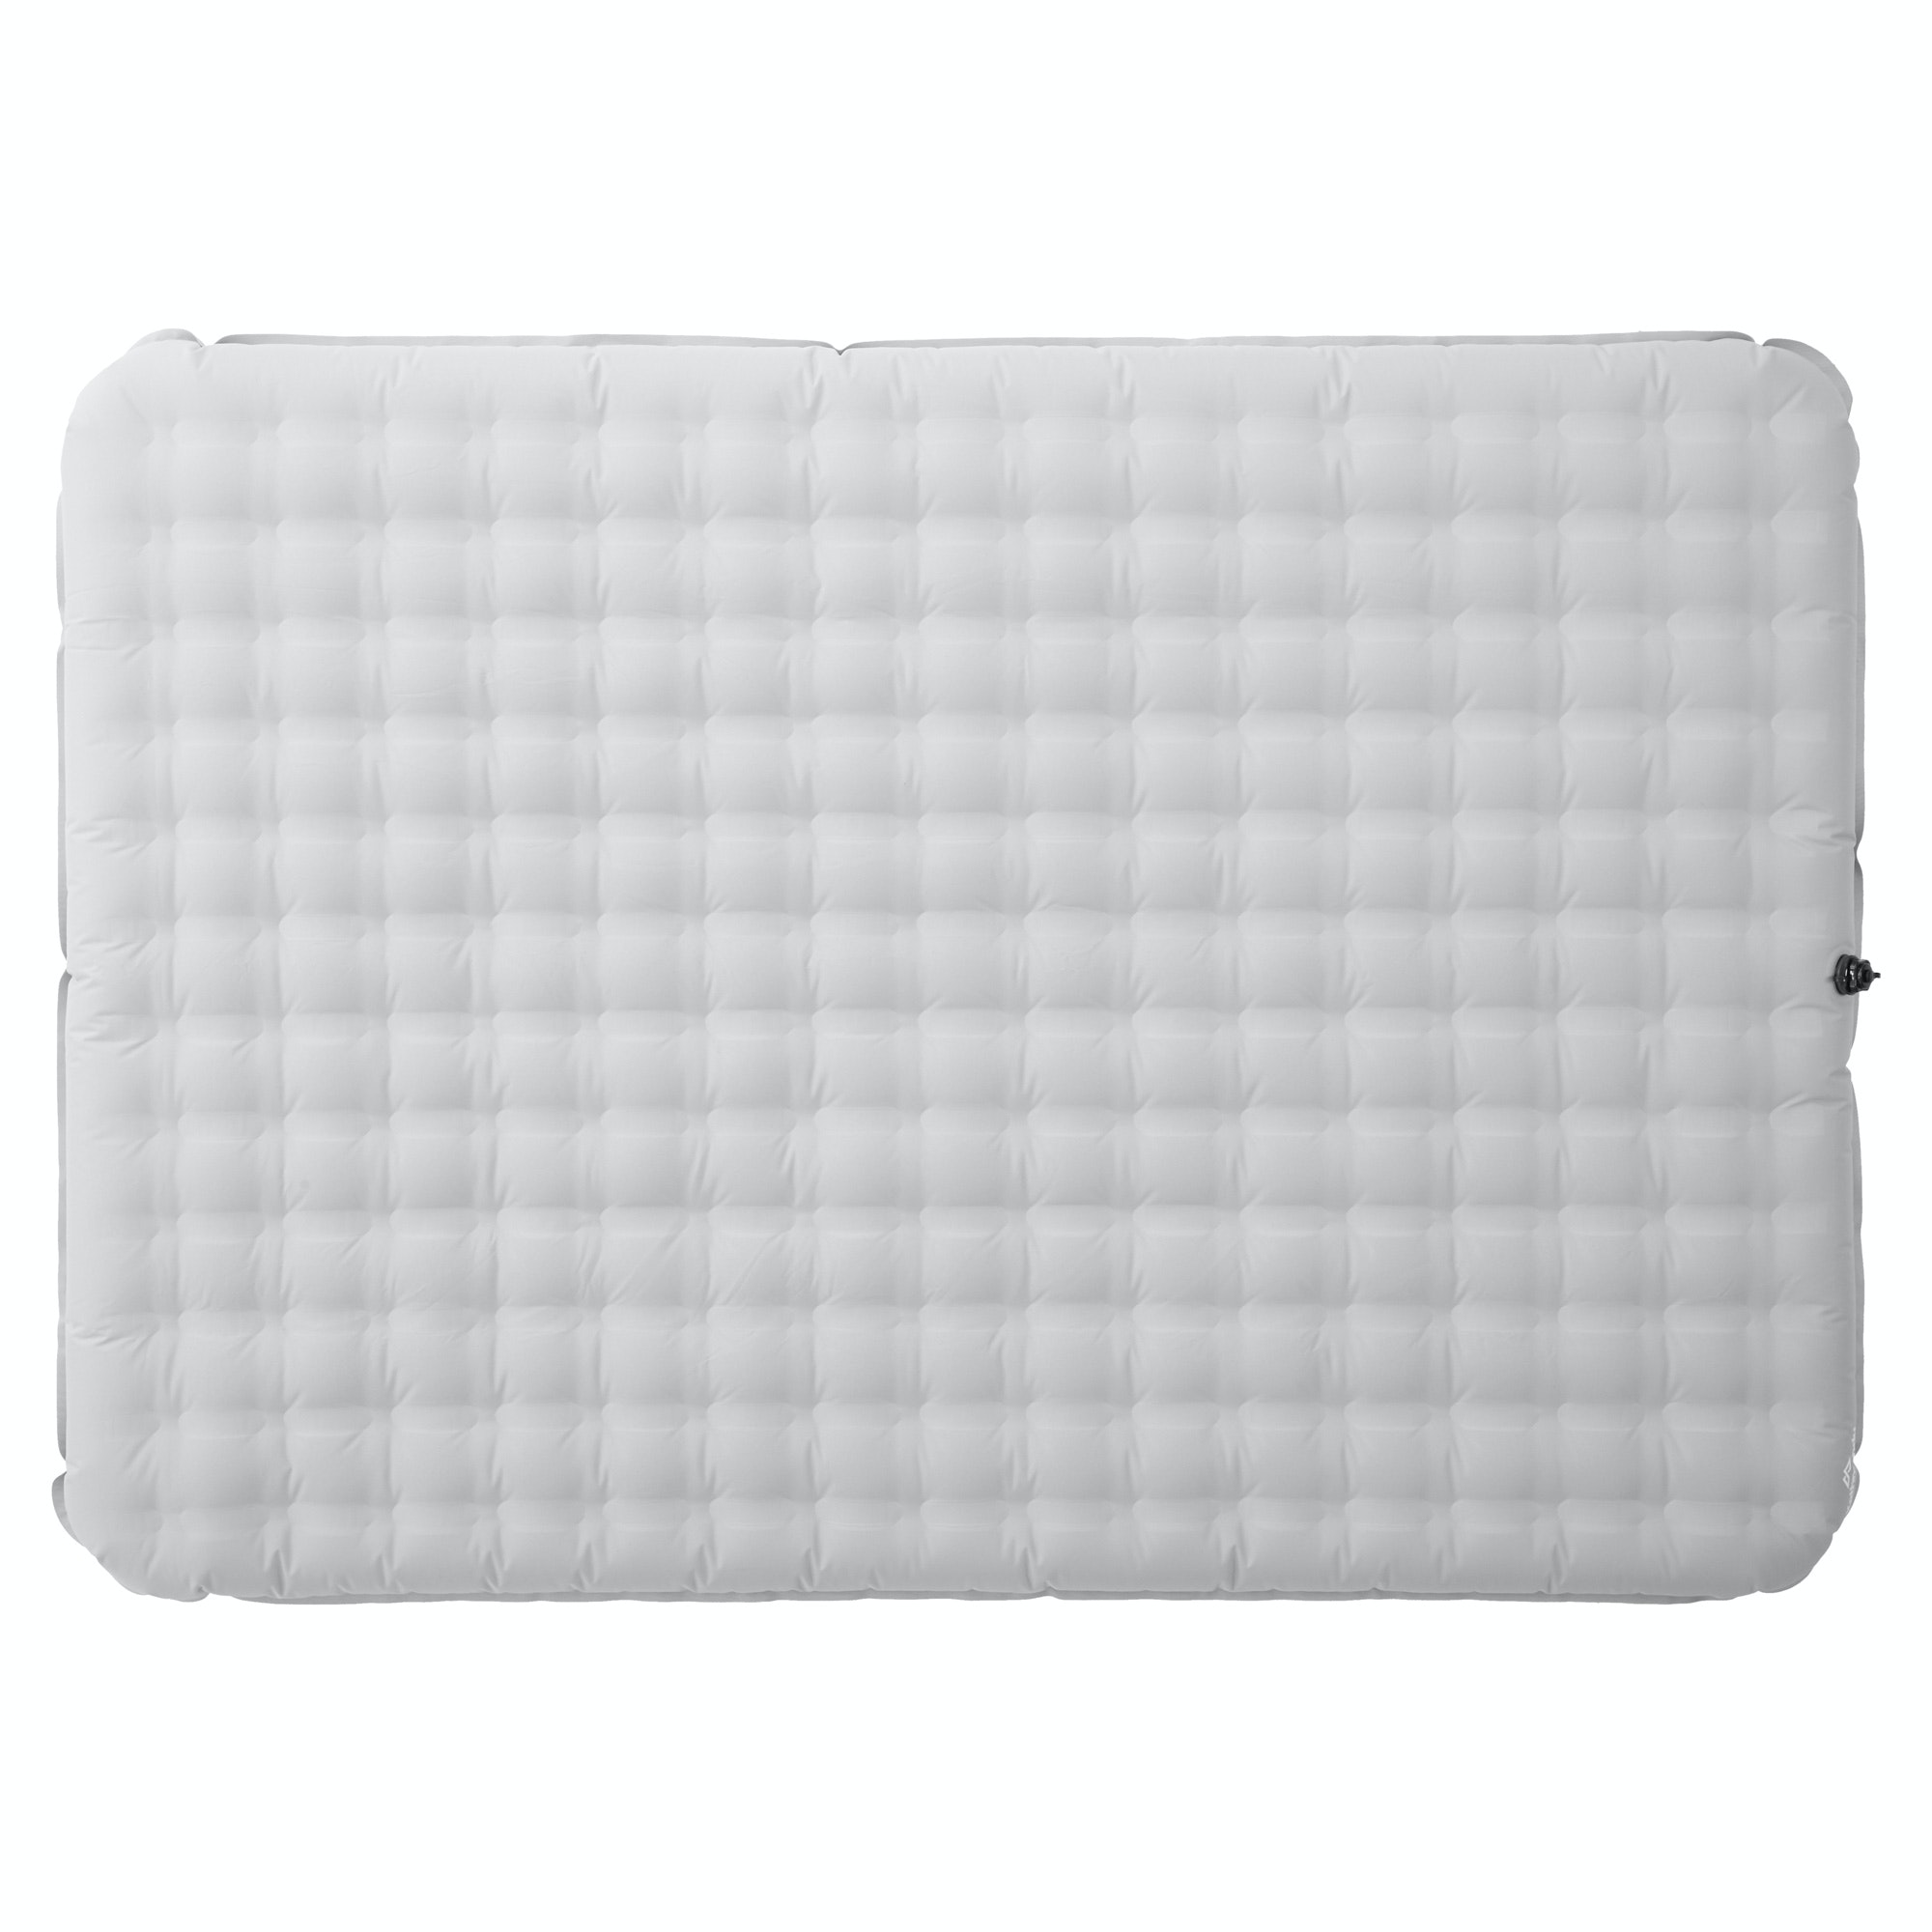 Roamer Double TPU Air Bed